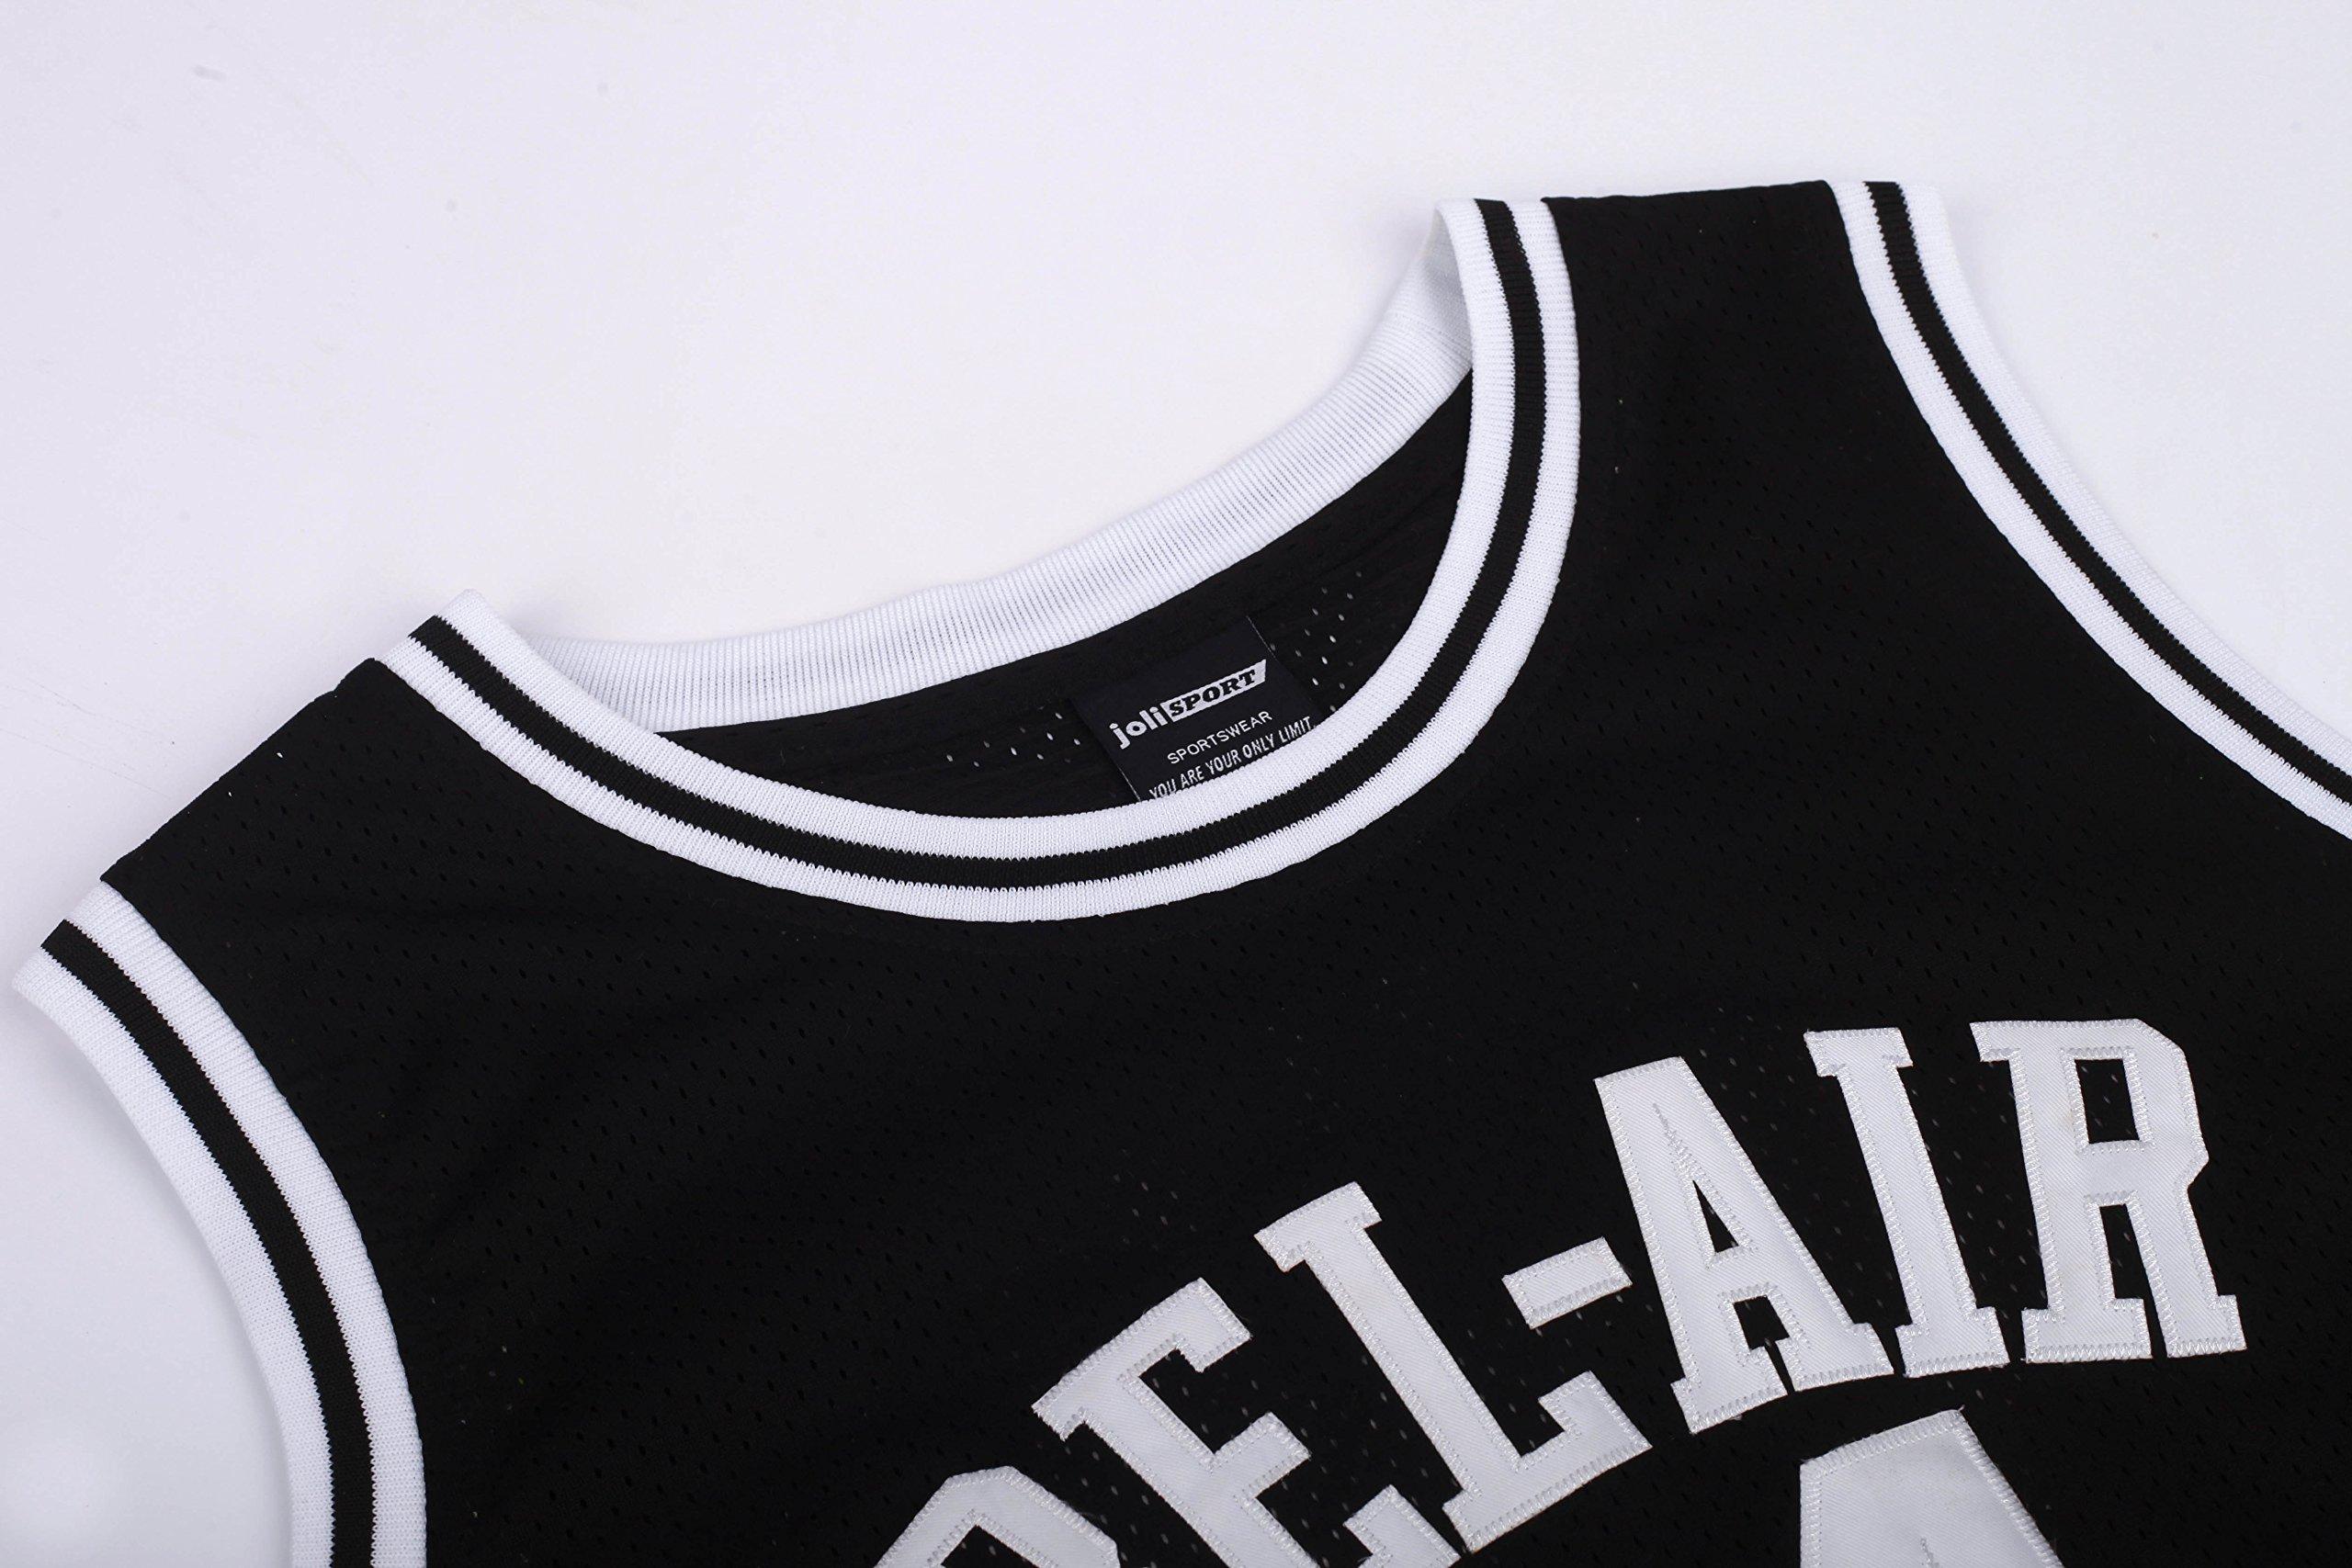 aa44f8d67be7 JOLI SPORT Smith  14 Bel Air Academy Black Basketball Jersey S-XXXL (Small)    Jerseys   Sports   Outdoors - tibs